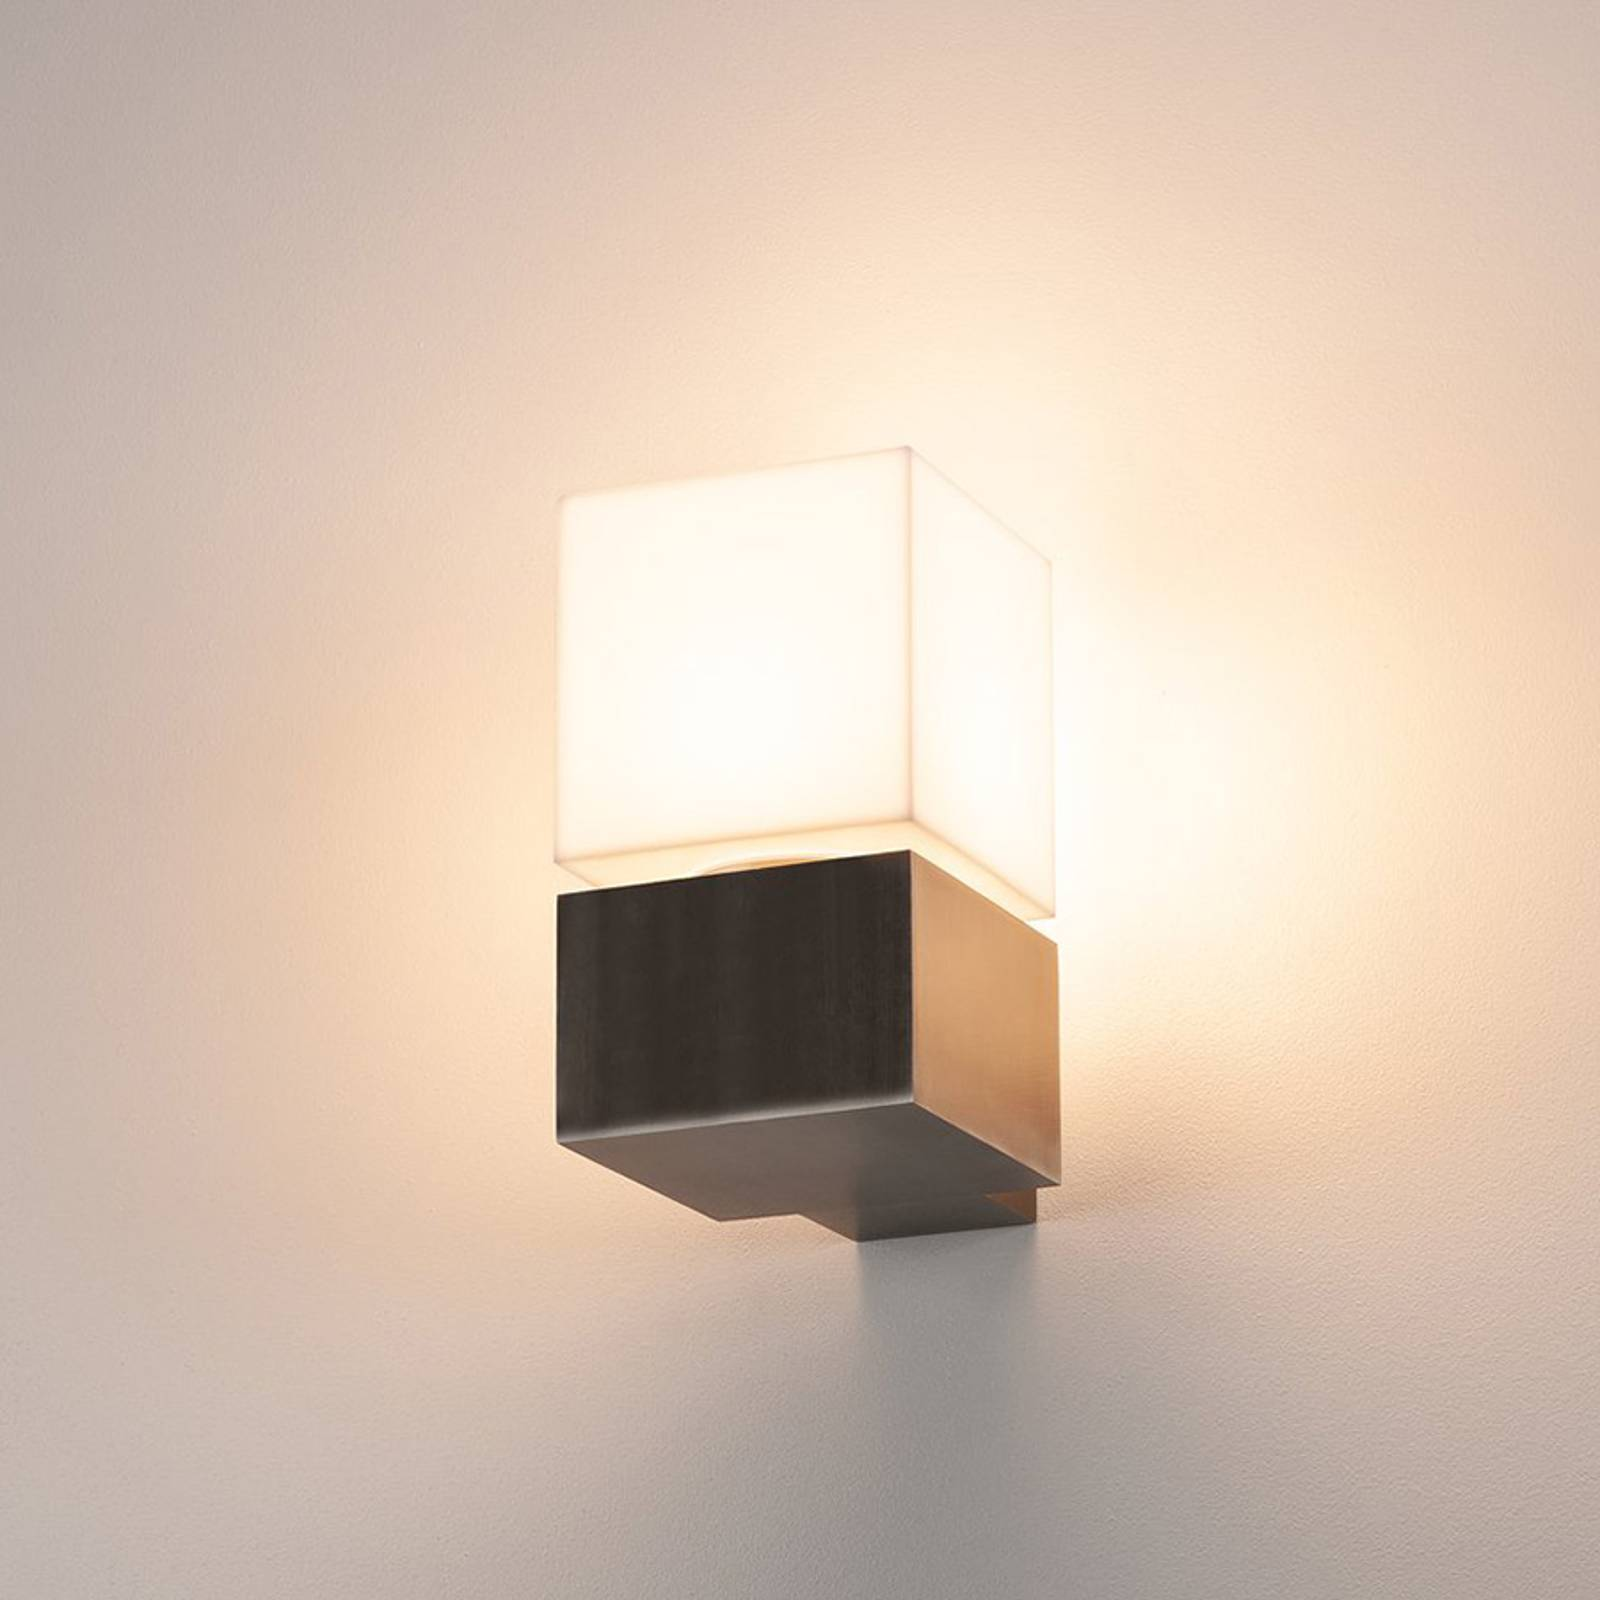 SLV Square LED-Außenwandleuchte, dimmbar